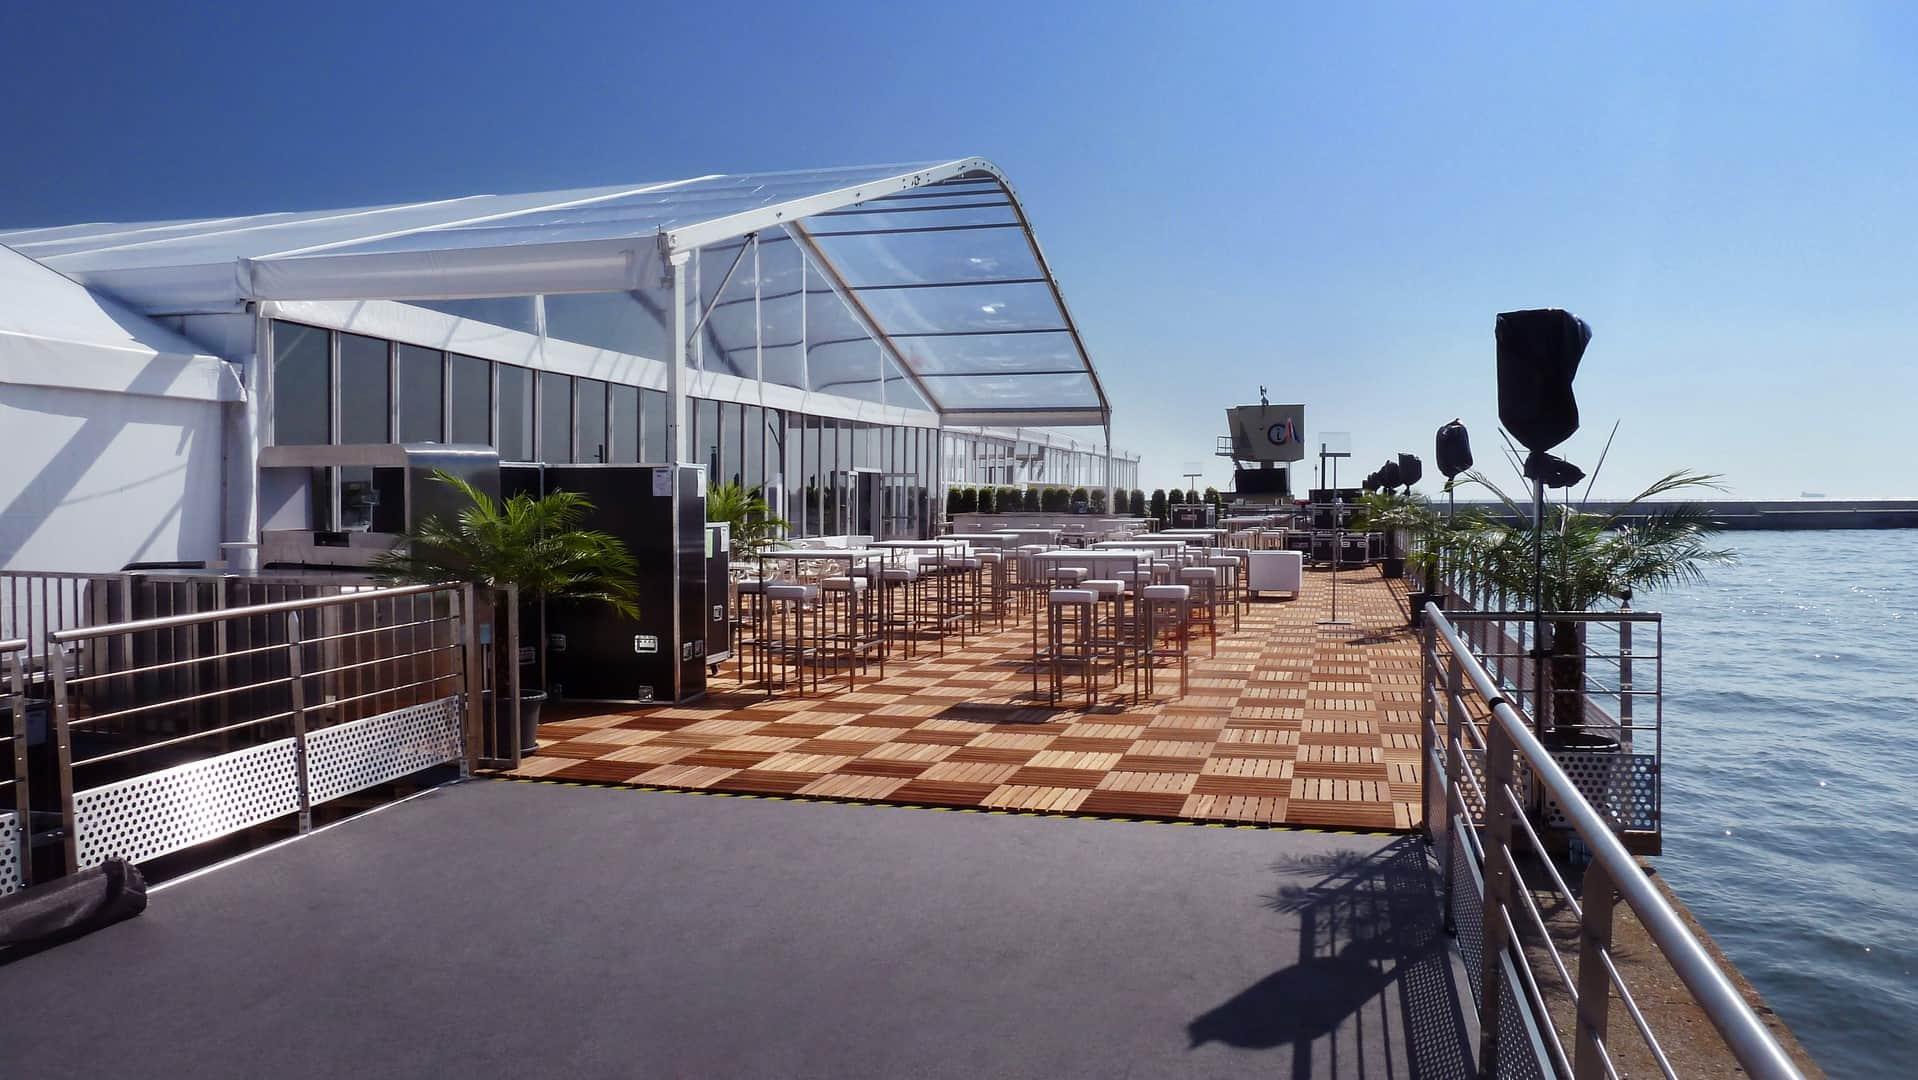 location-structure-arquee-terrasse-copy